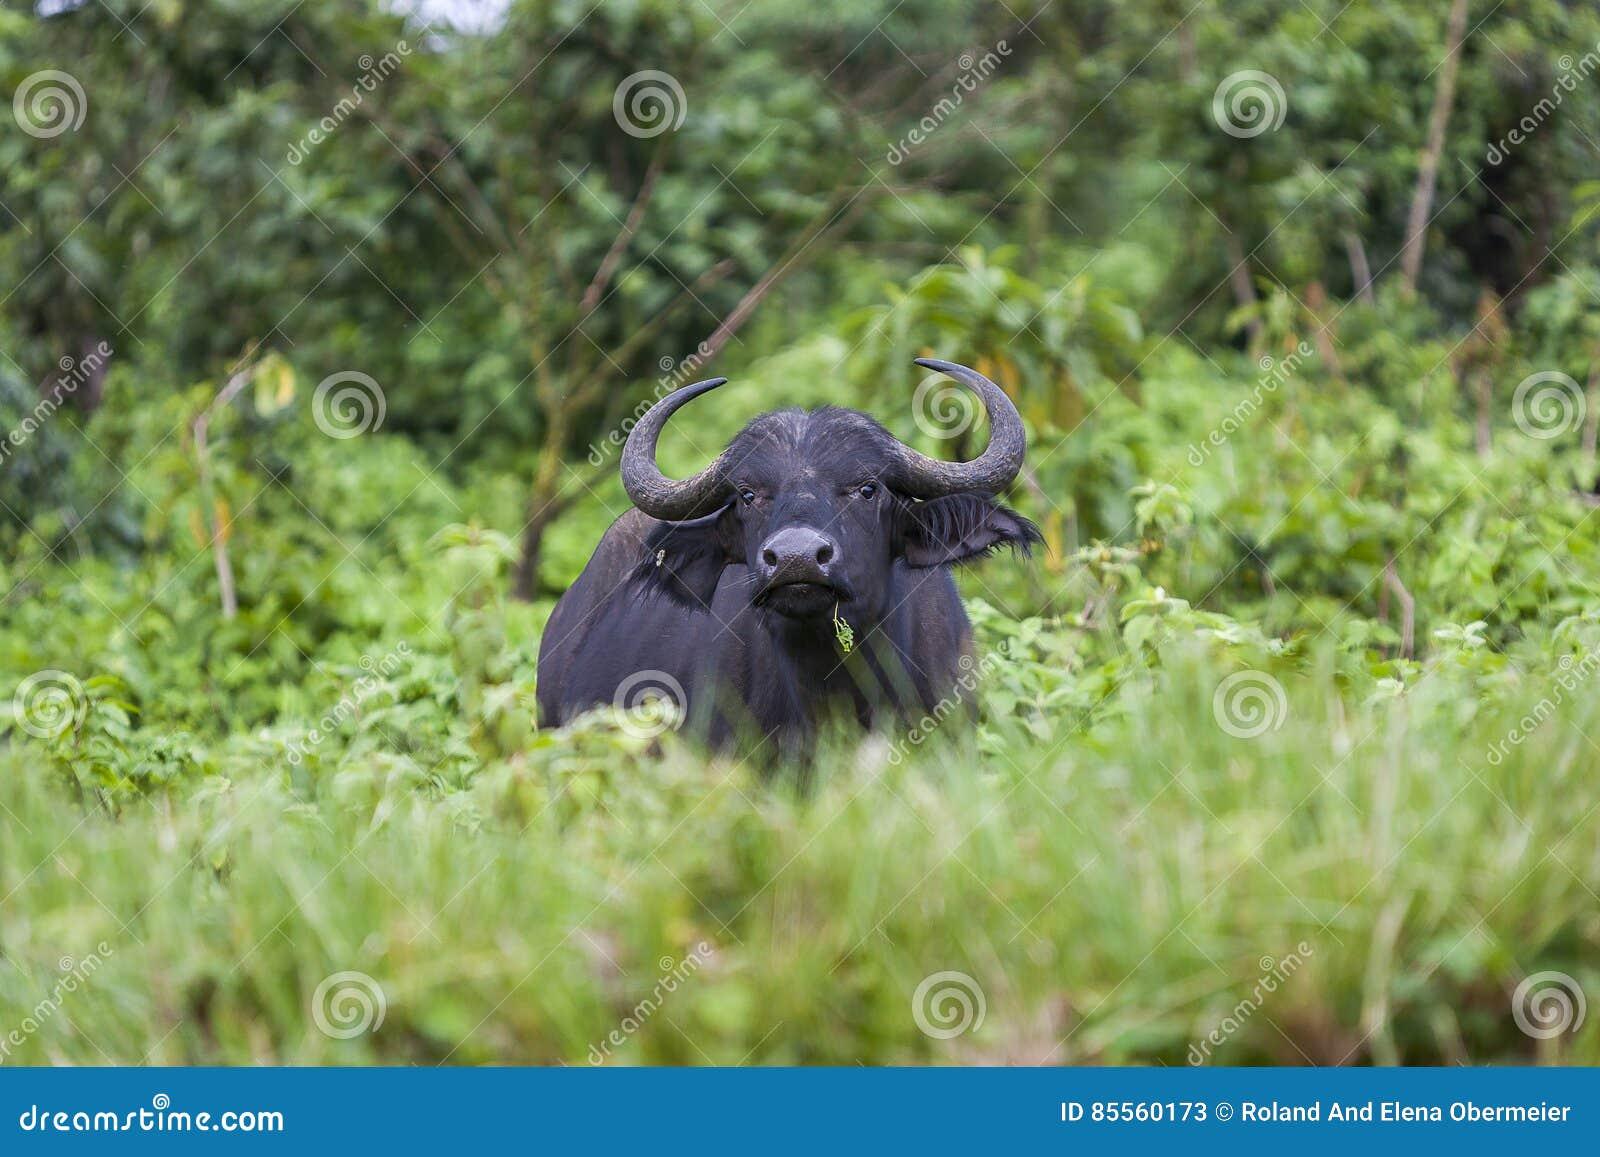 Afrikanischer Büffel nahe Ngorongoro-Krater